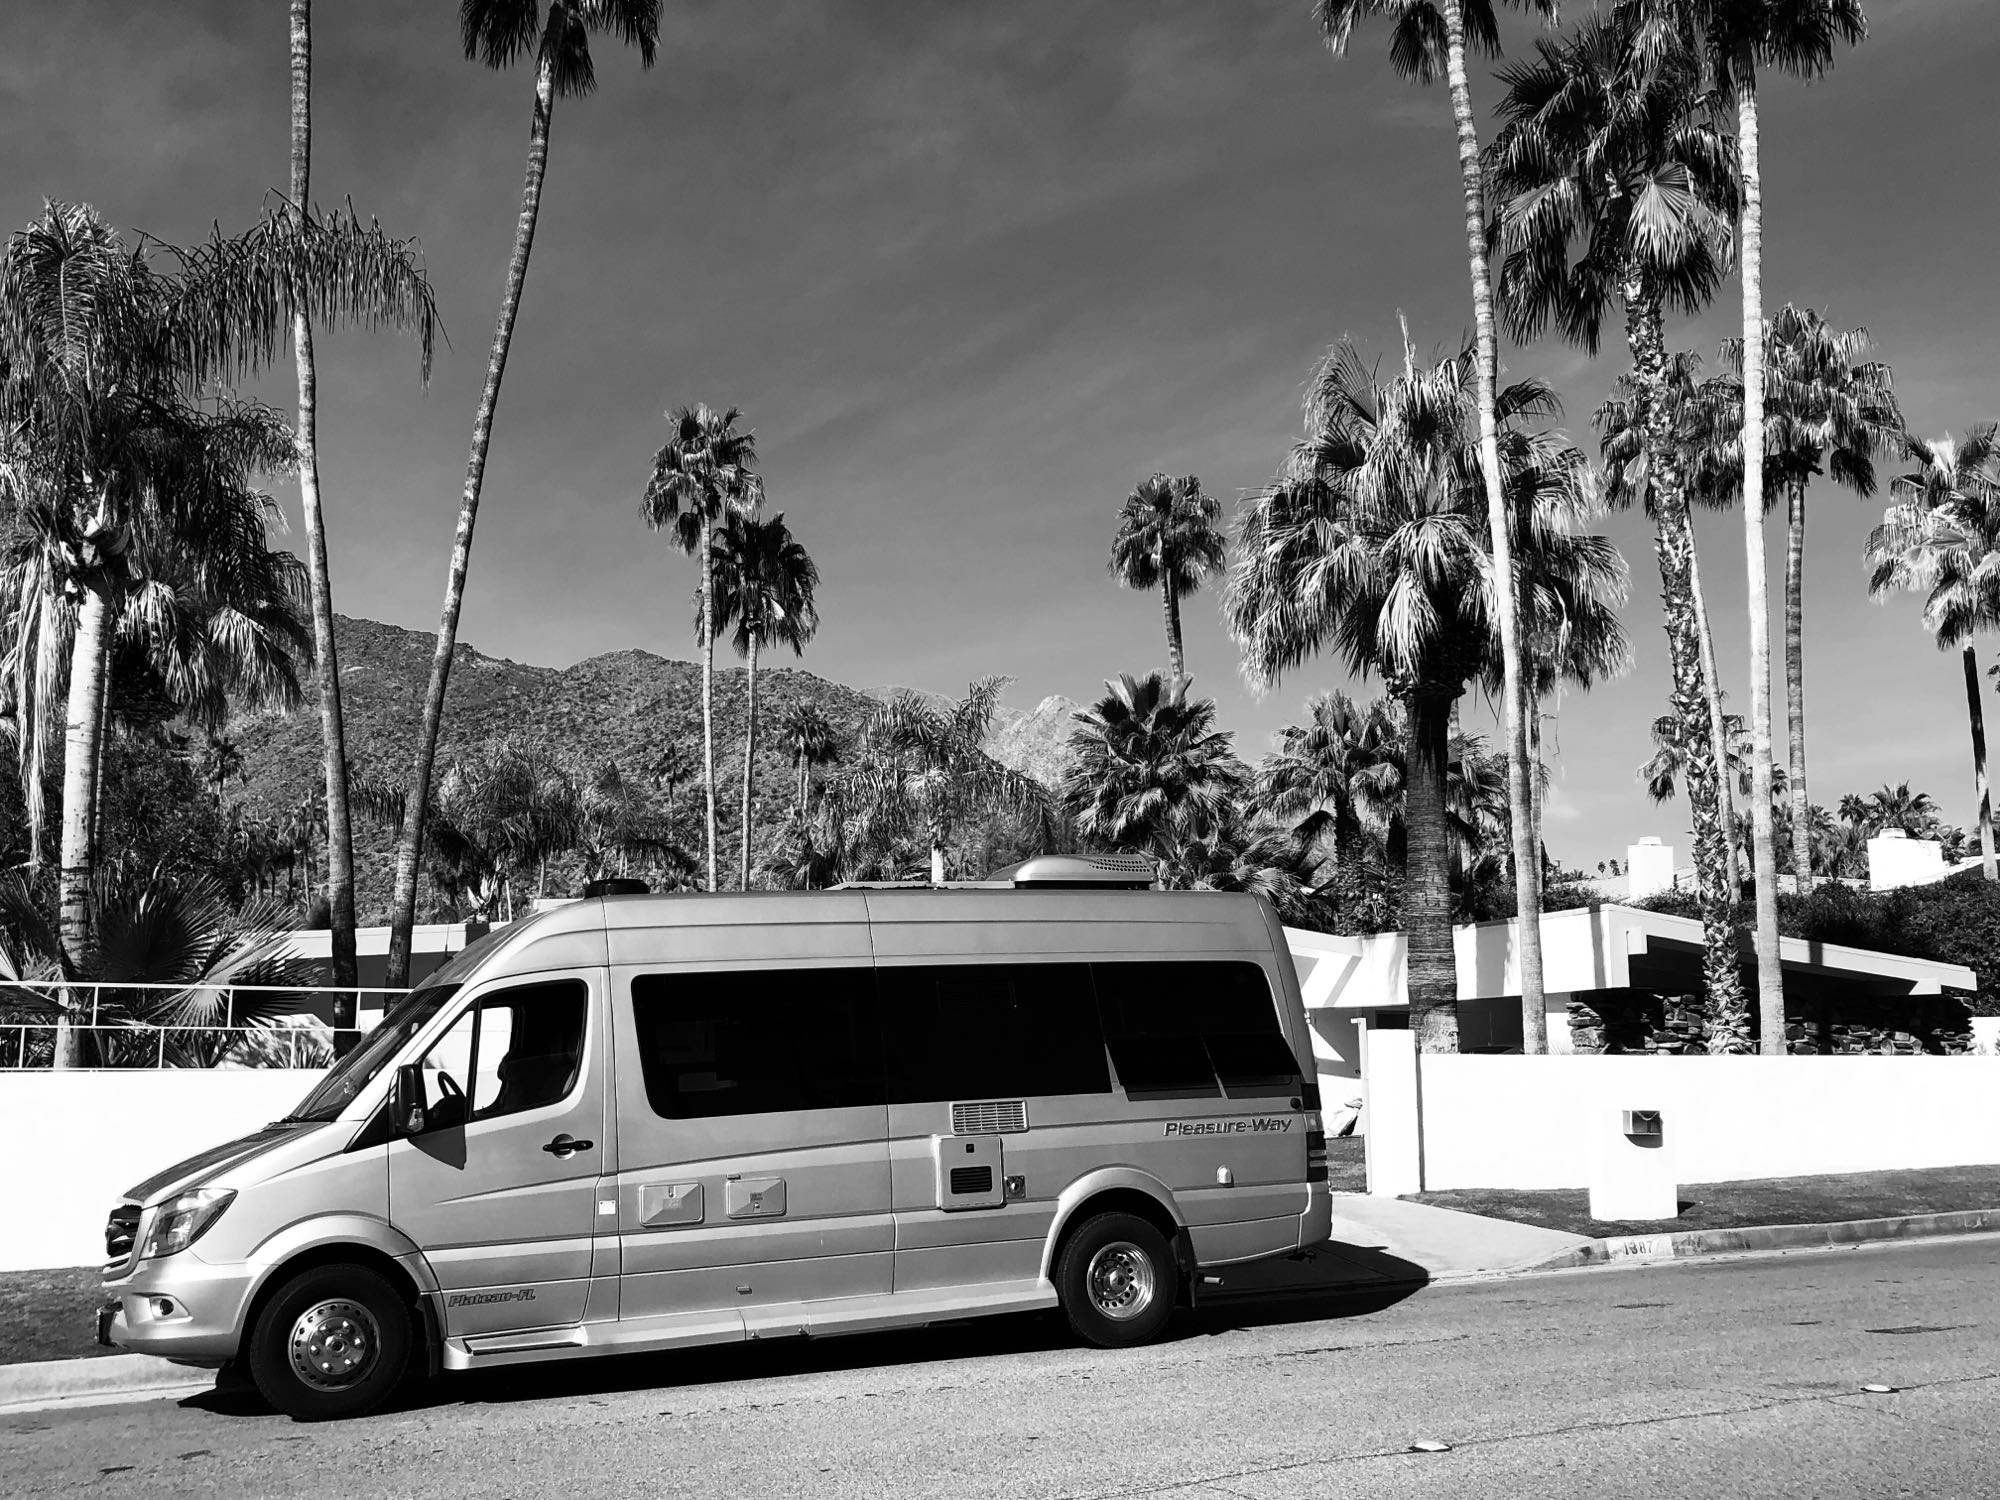 Swanky for Palm Springs. . Mercedez Benz Pleasure Way Plateau Fl 2018